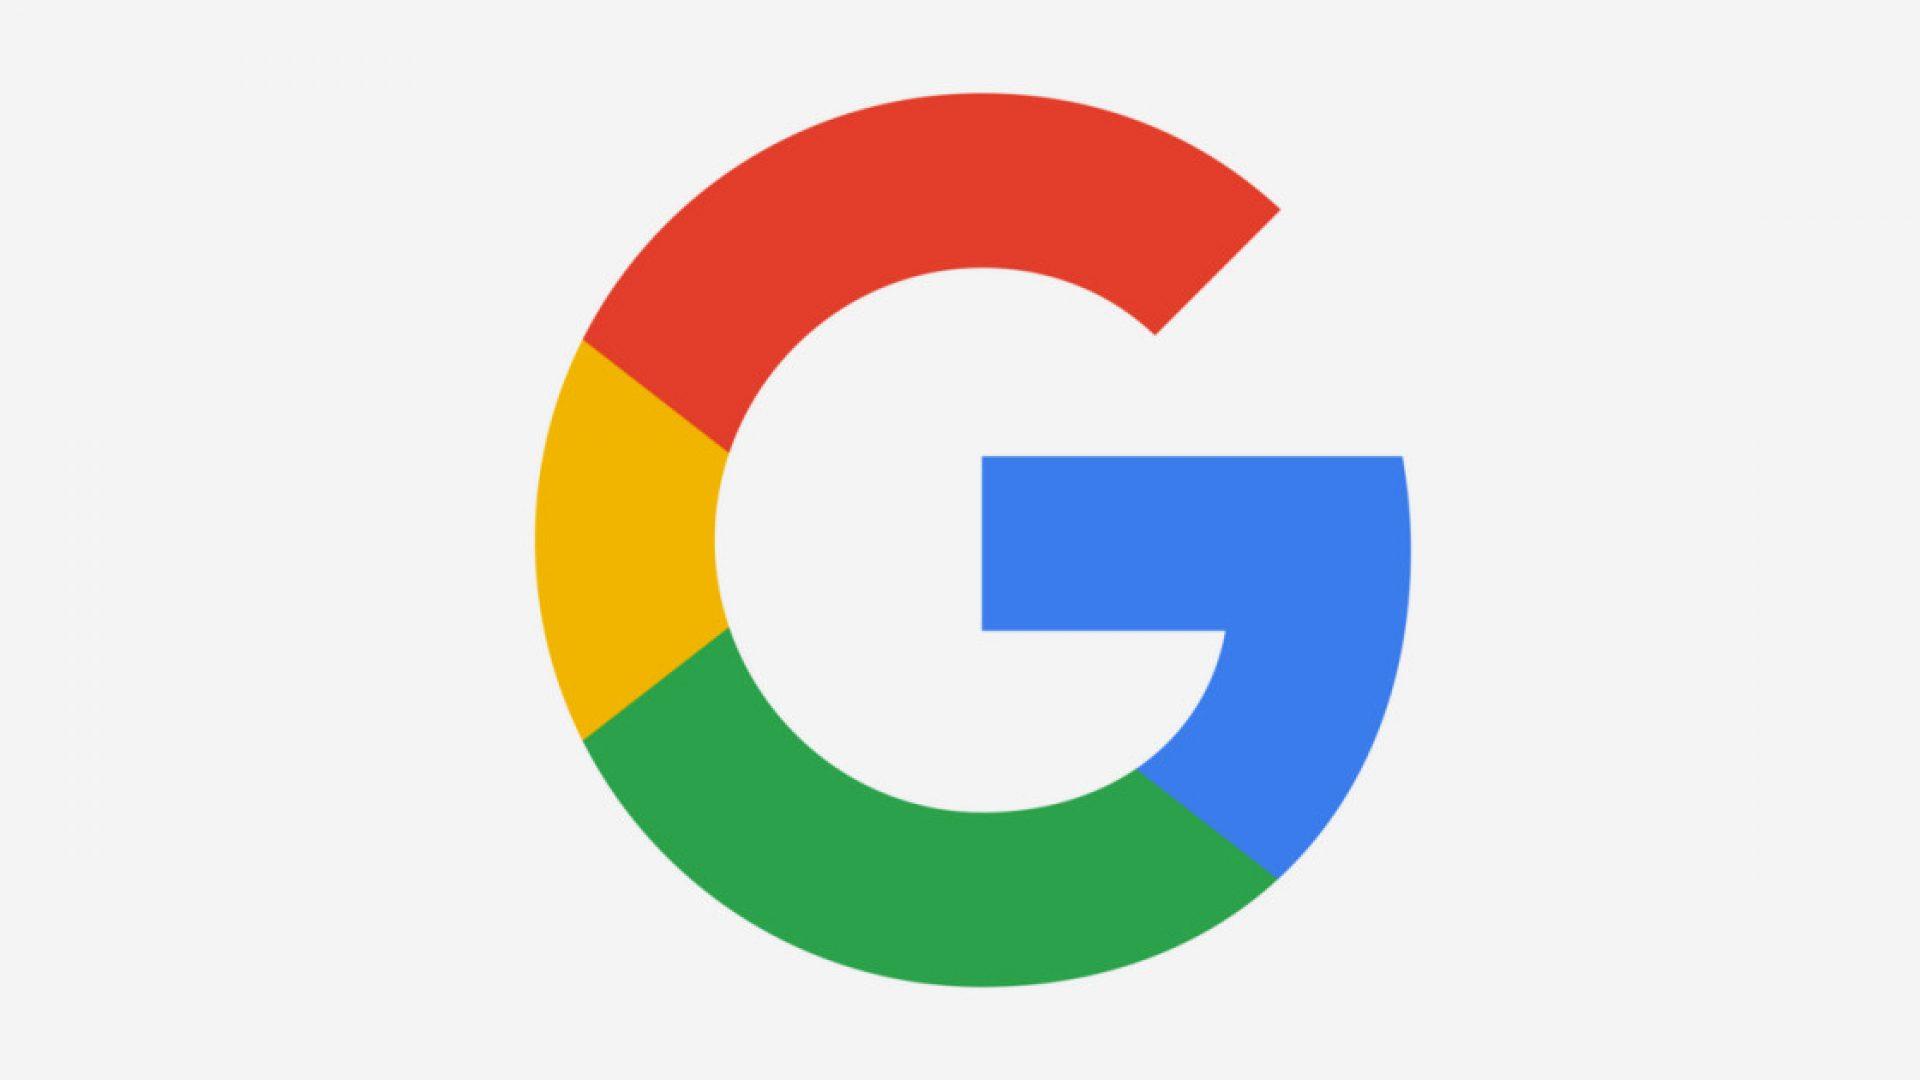 logo G - Google